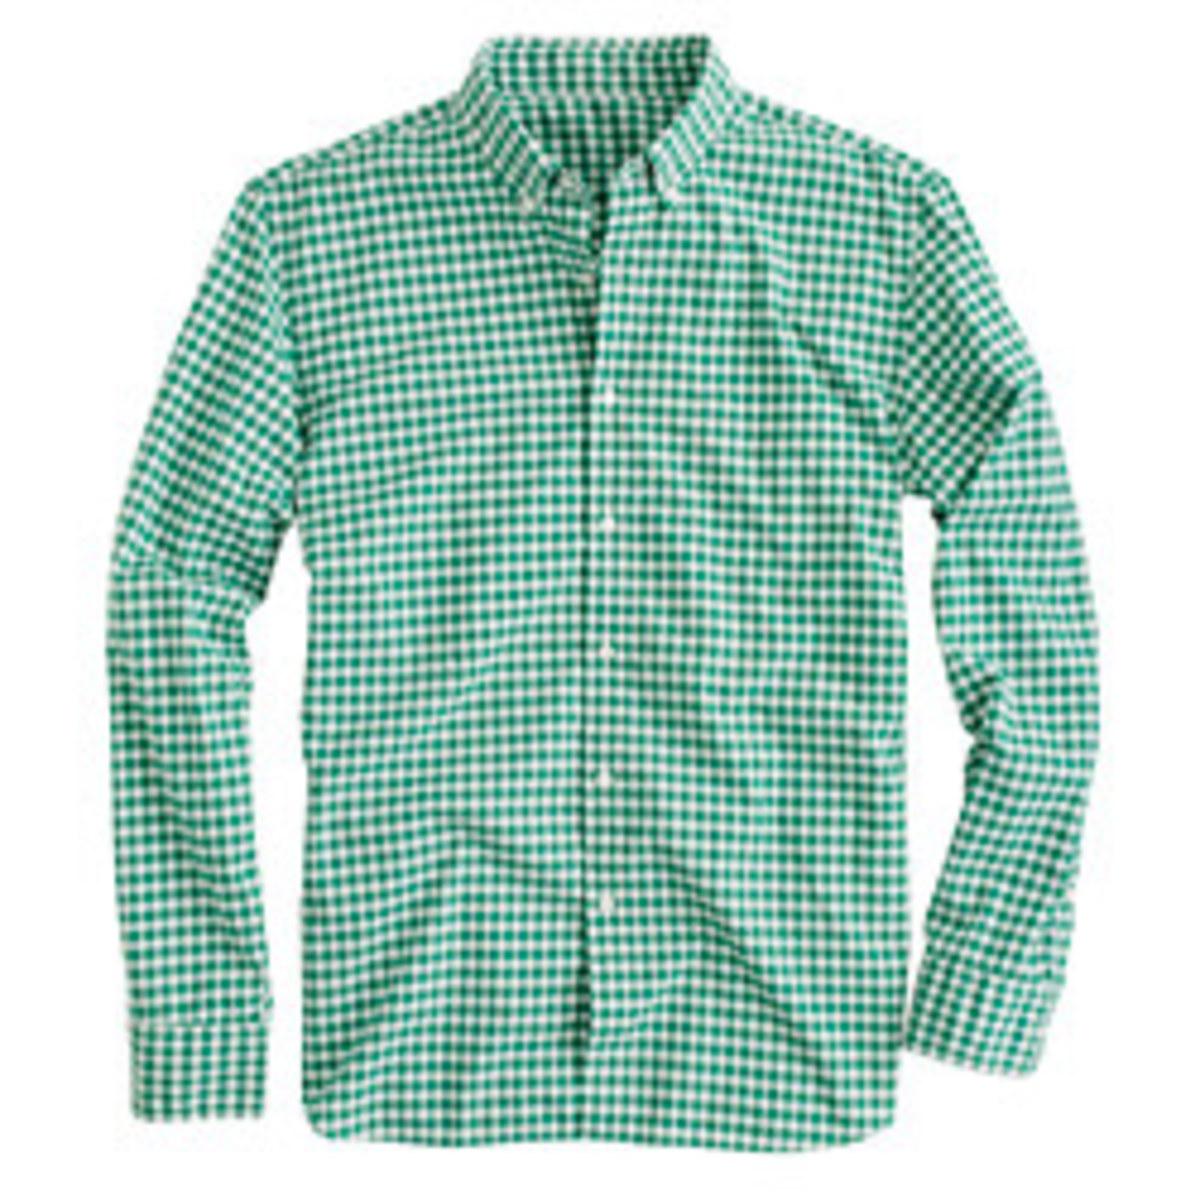 J.Crew. Secret Wash shirt in green gingham, $64.50